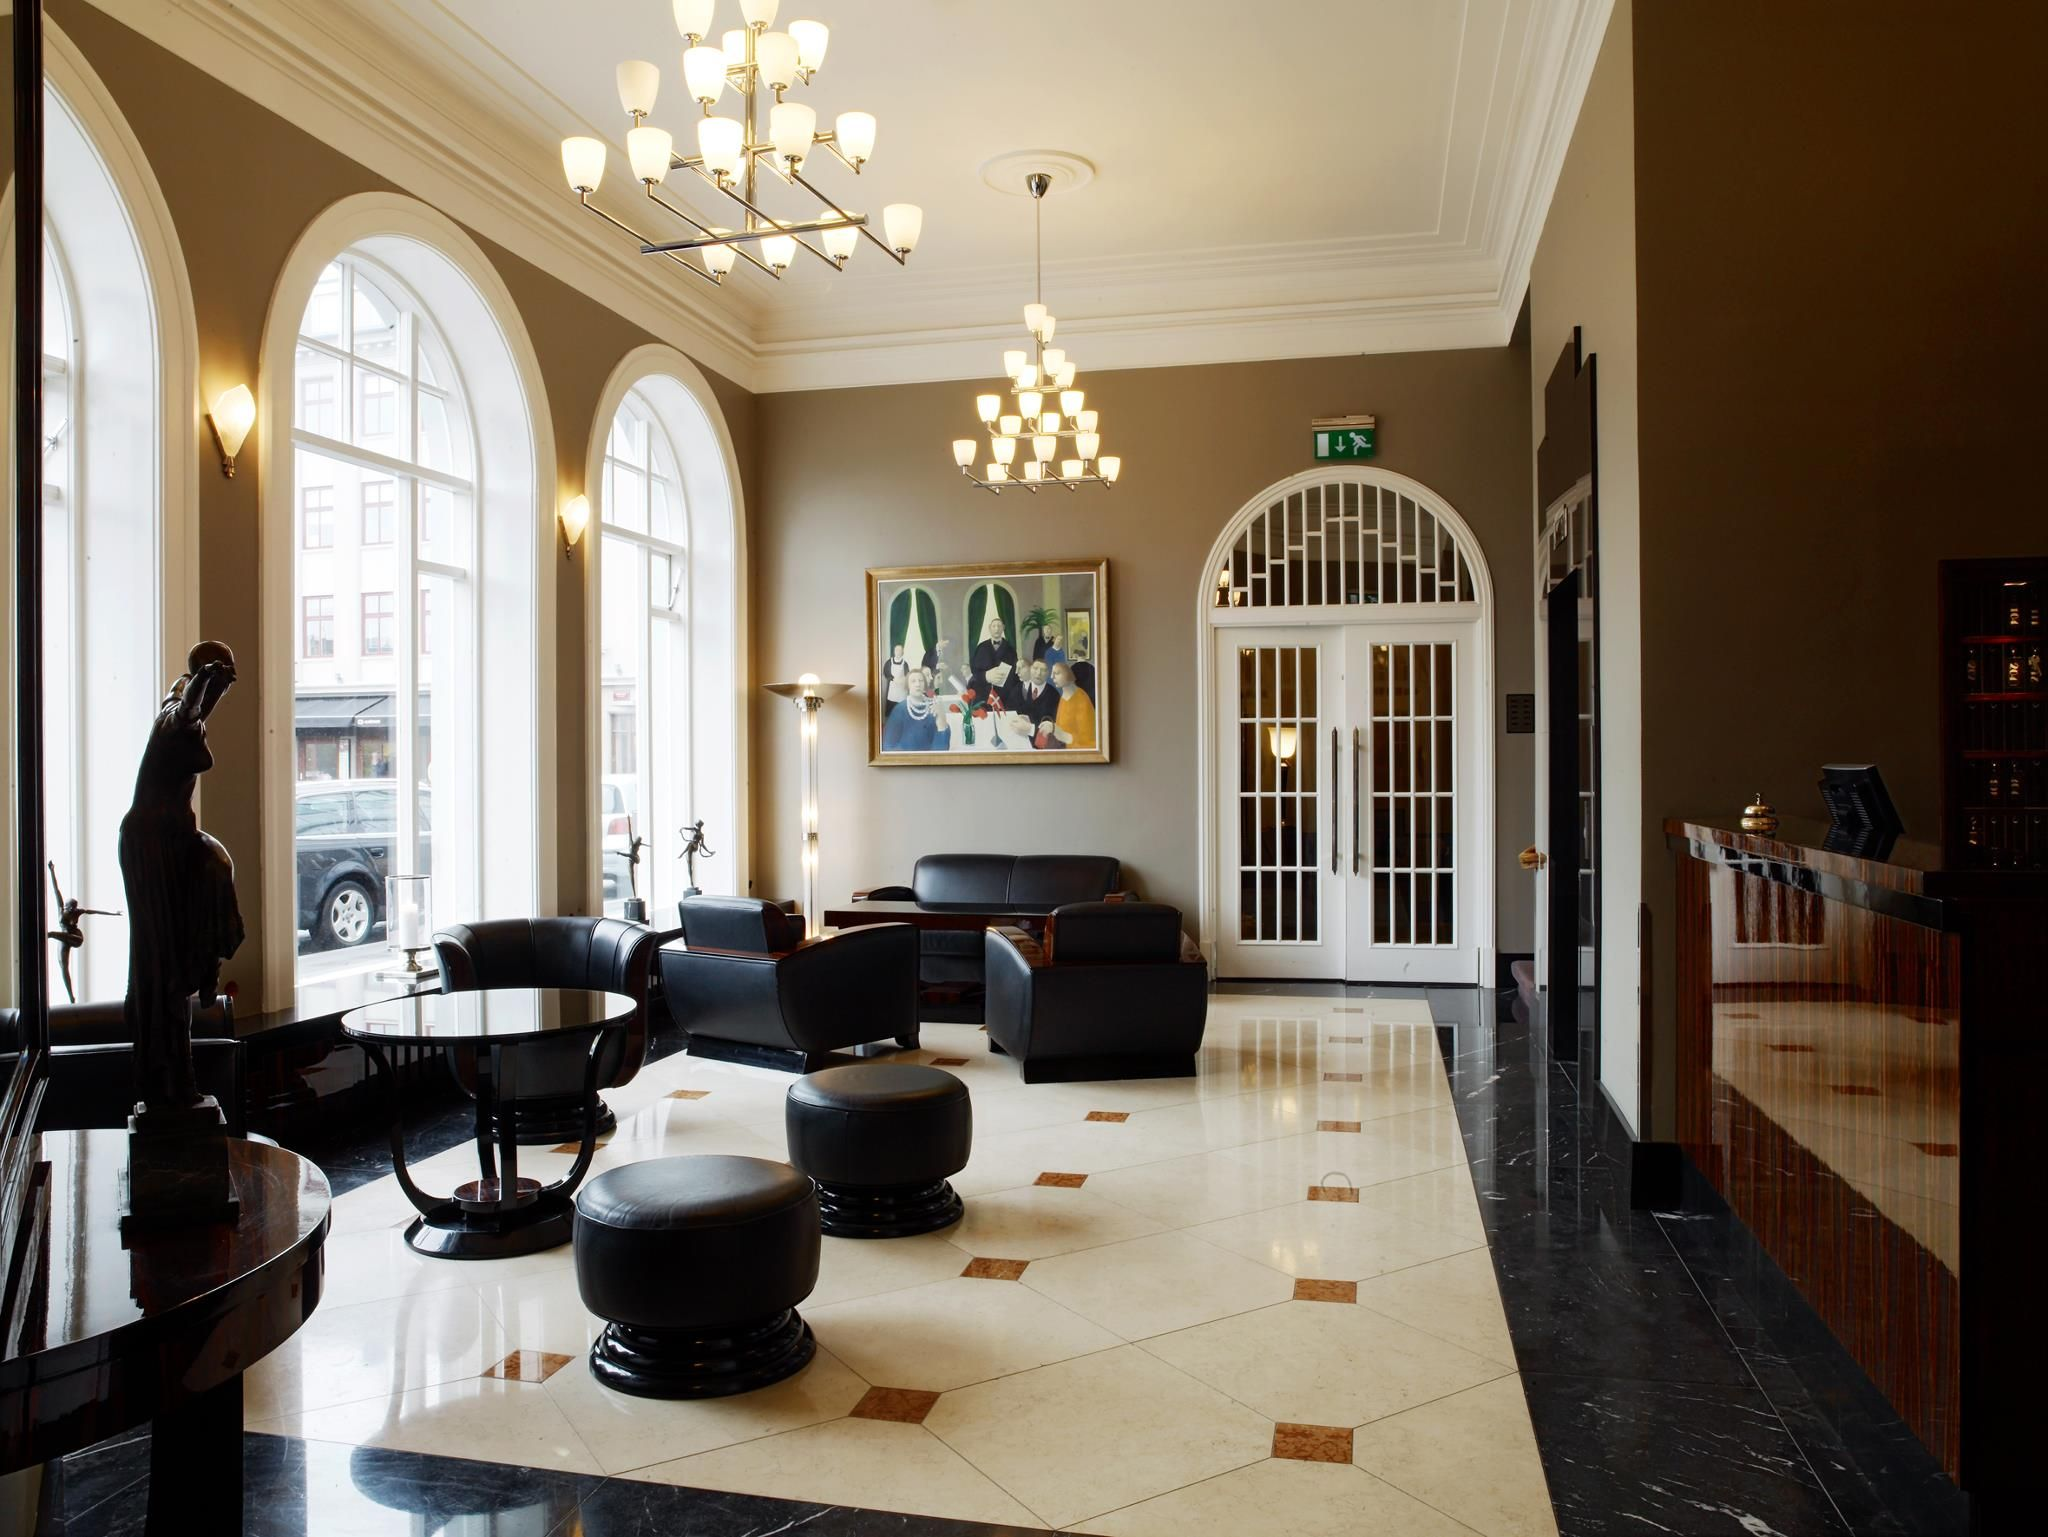 Best Design Hotels In Reykjavik My Agenda